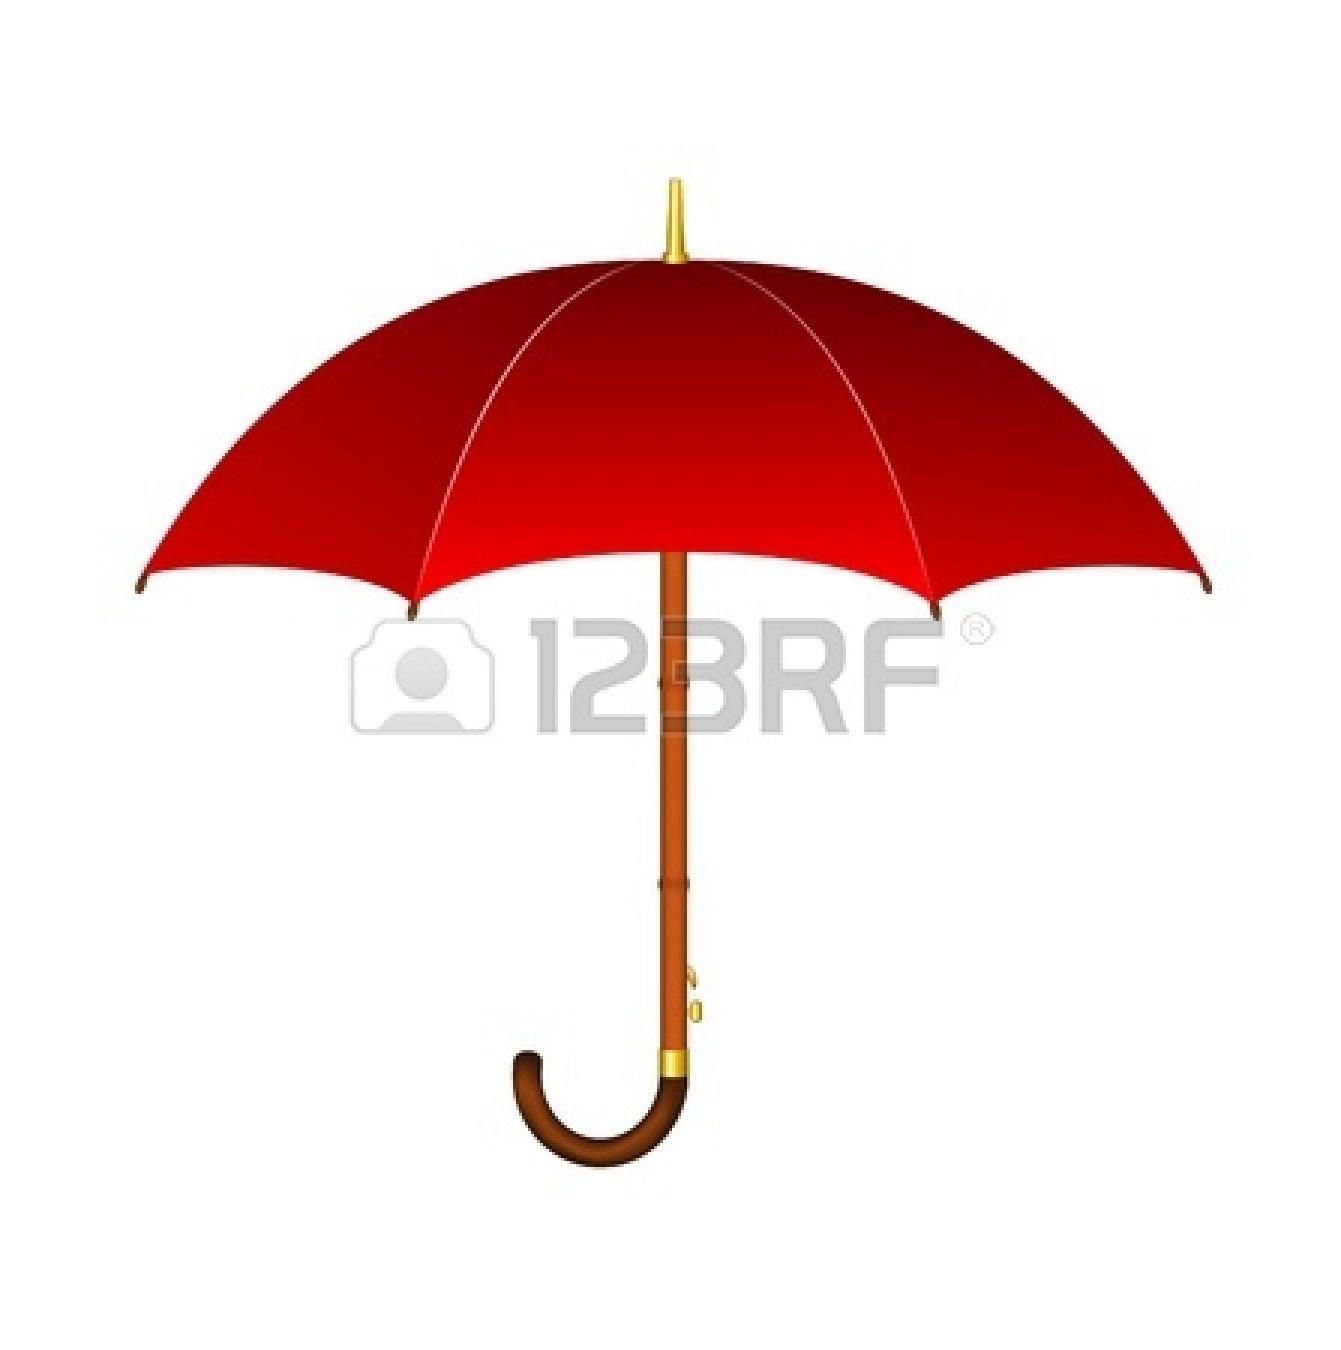 Red Closed Umbrella | Clipart Panda - Free Clipart Images